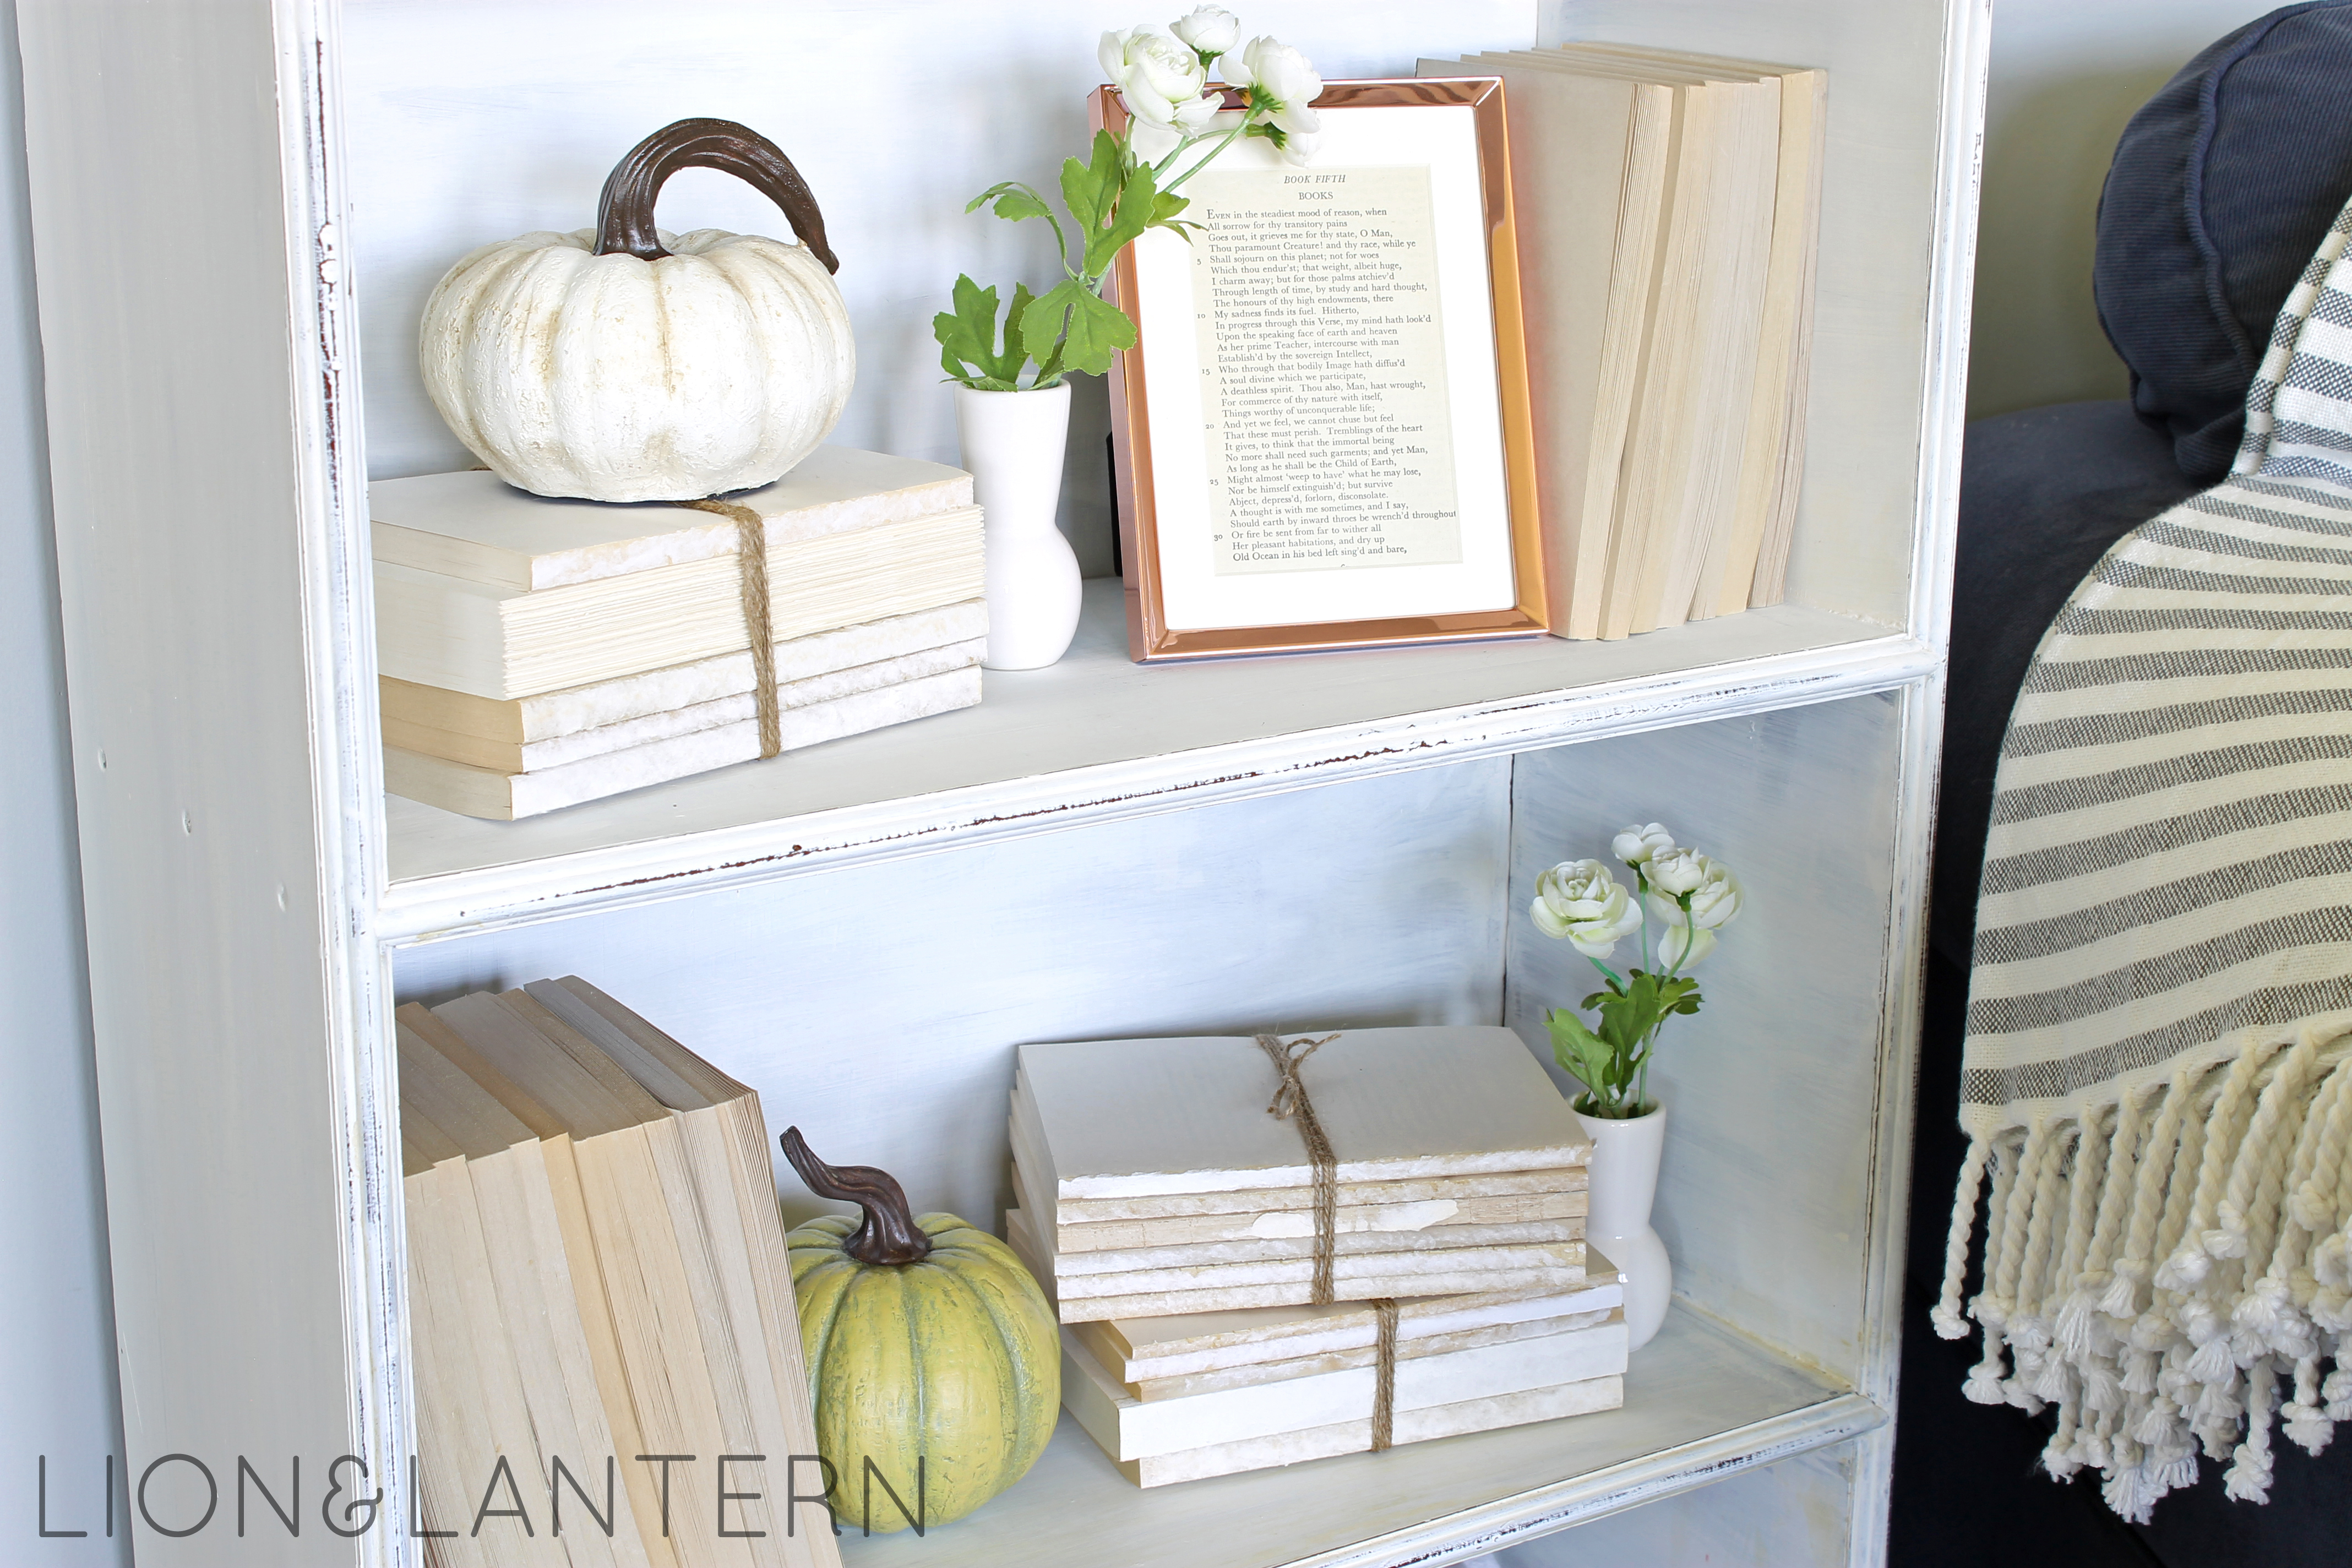 Cozy Autumn Bookcase Decor at LionAndLantern.com. Book bundle, neutral pumpkin, copper frame.